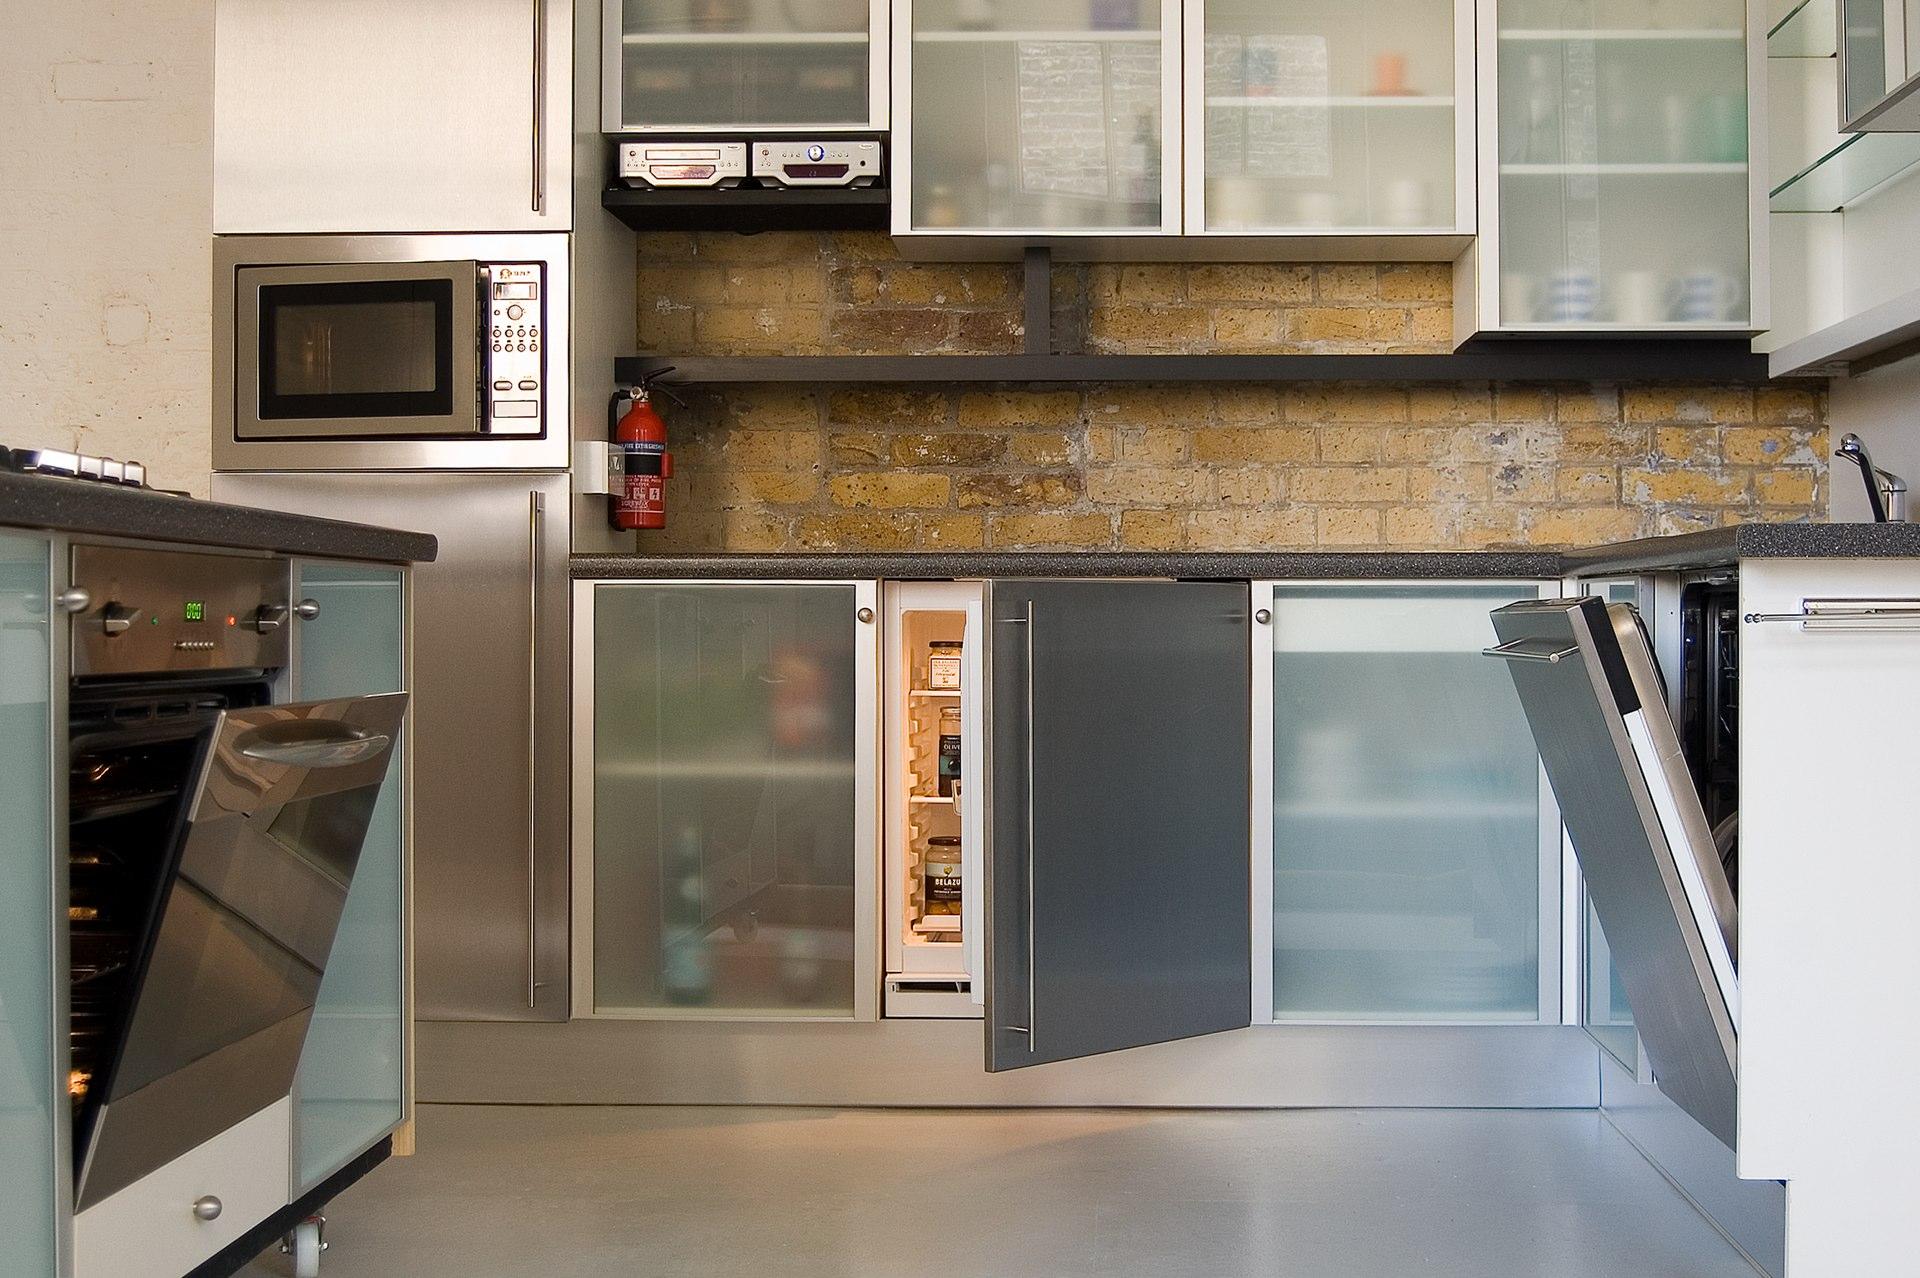 studio one kitchen appliances